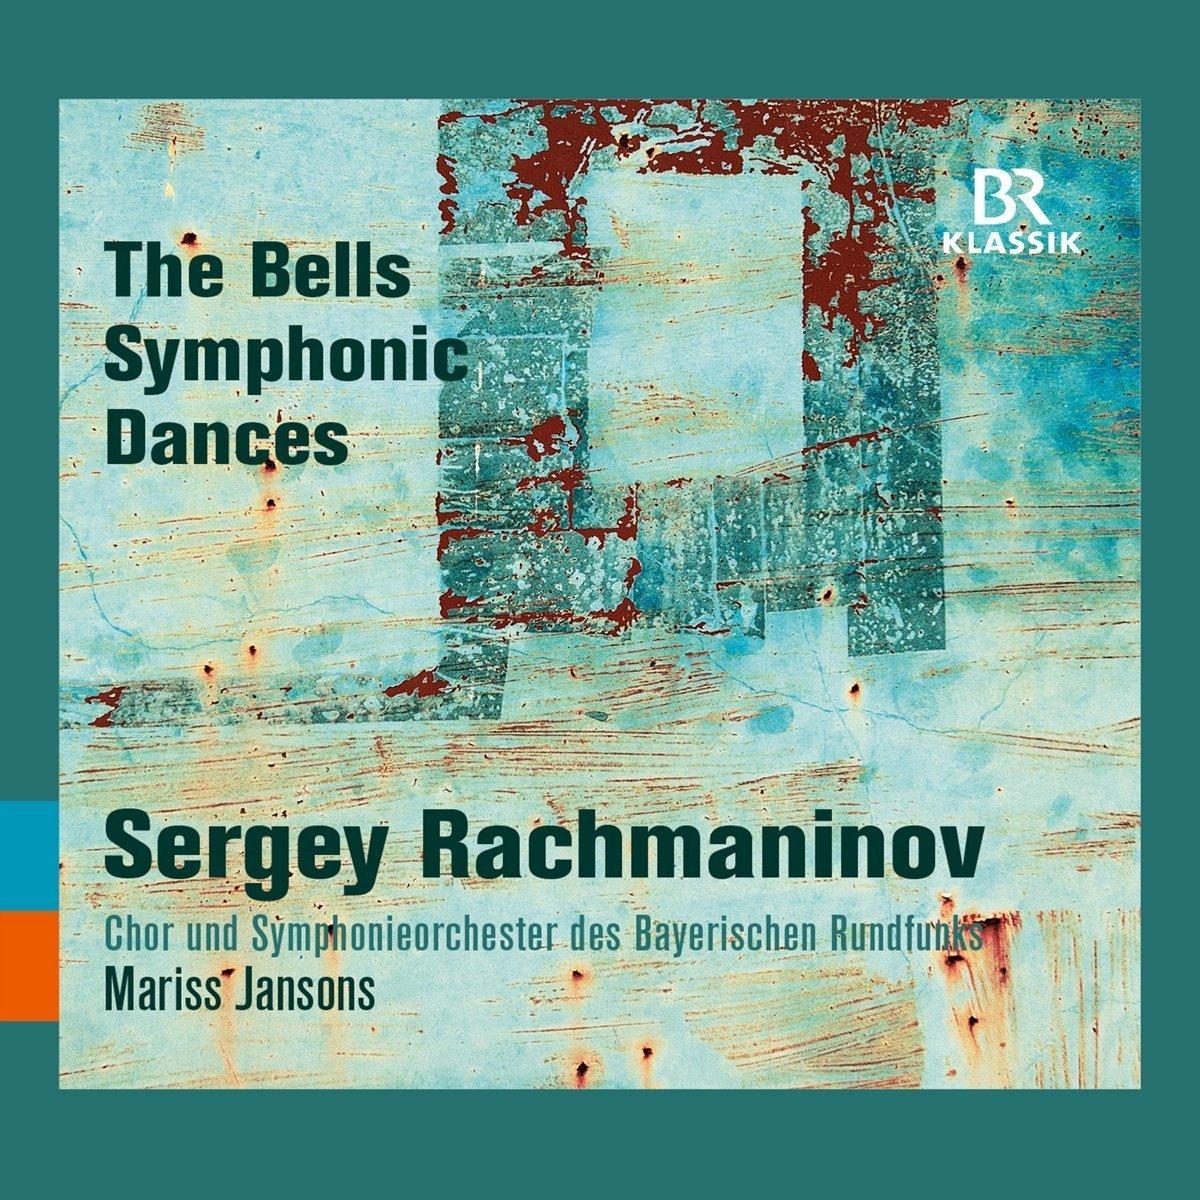 The bells op.35 Symphonic dances op.45 Sergueï Rachmaninov, comp. Tatiana Pavlovskaya, soprano Alexey Markov, baryton Oleg Dolgov, ténor Chor und Symphonieorchester des Bayerischen Rundfunks Mariss Jansons, direction